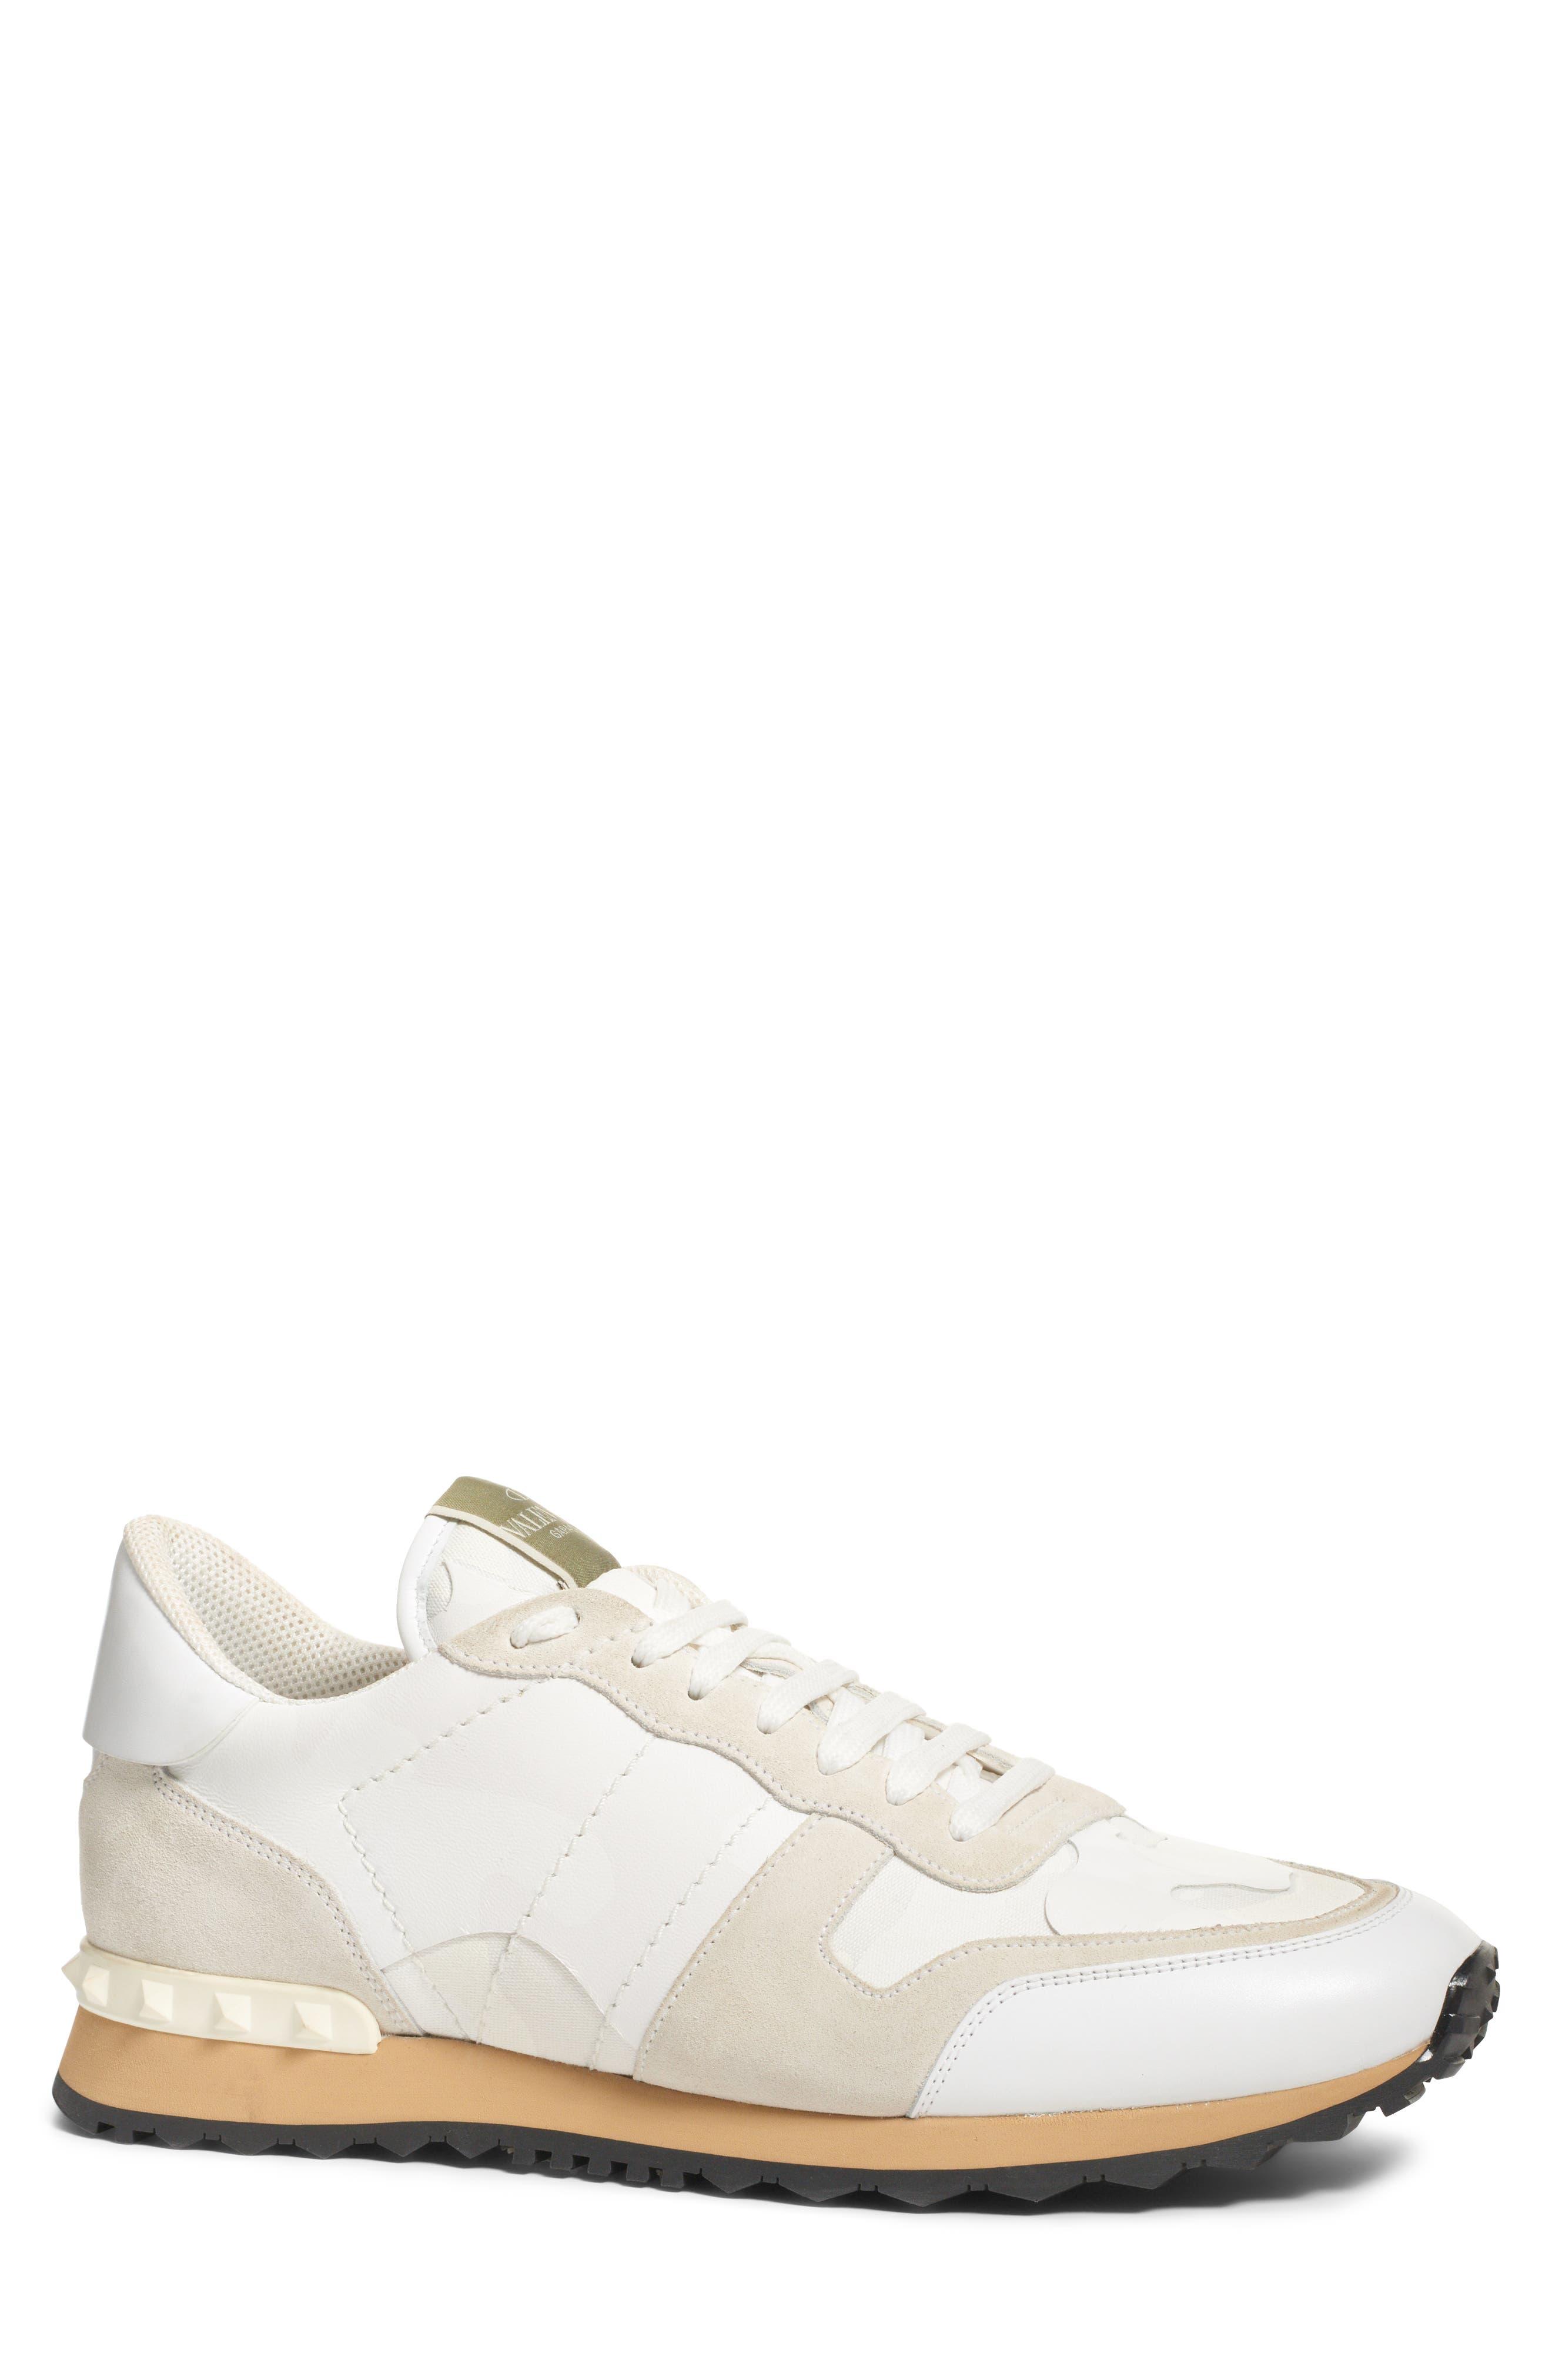 Camo Rockrunner Sneaker,                             Main thumbnail 1, color,                             WHITE